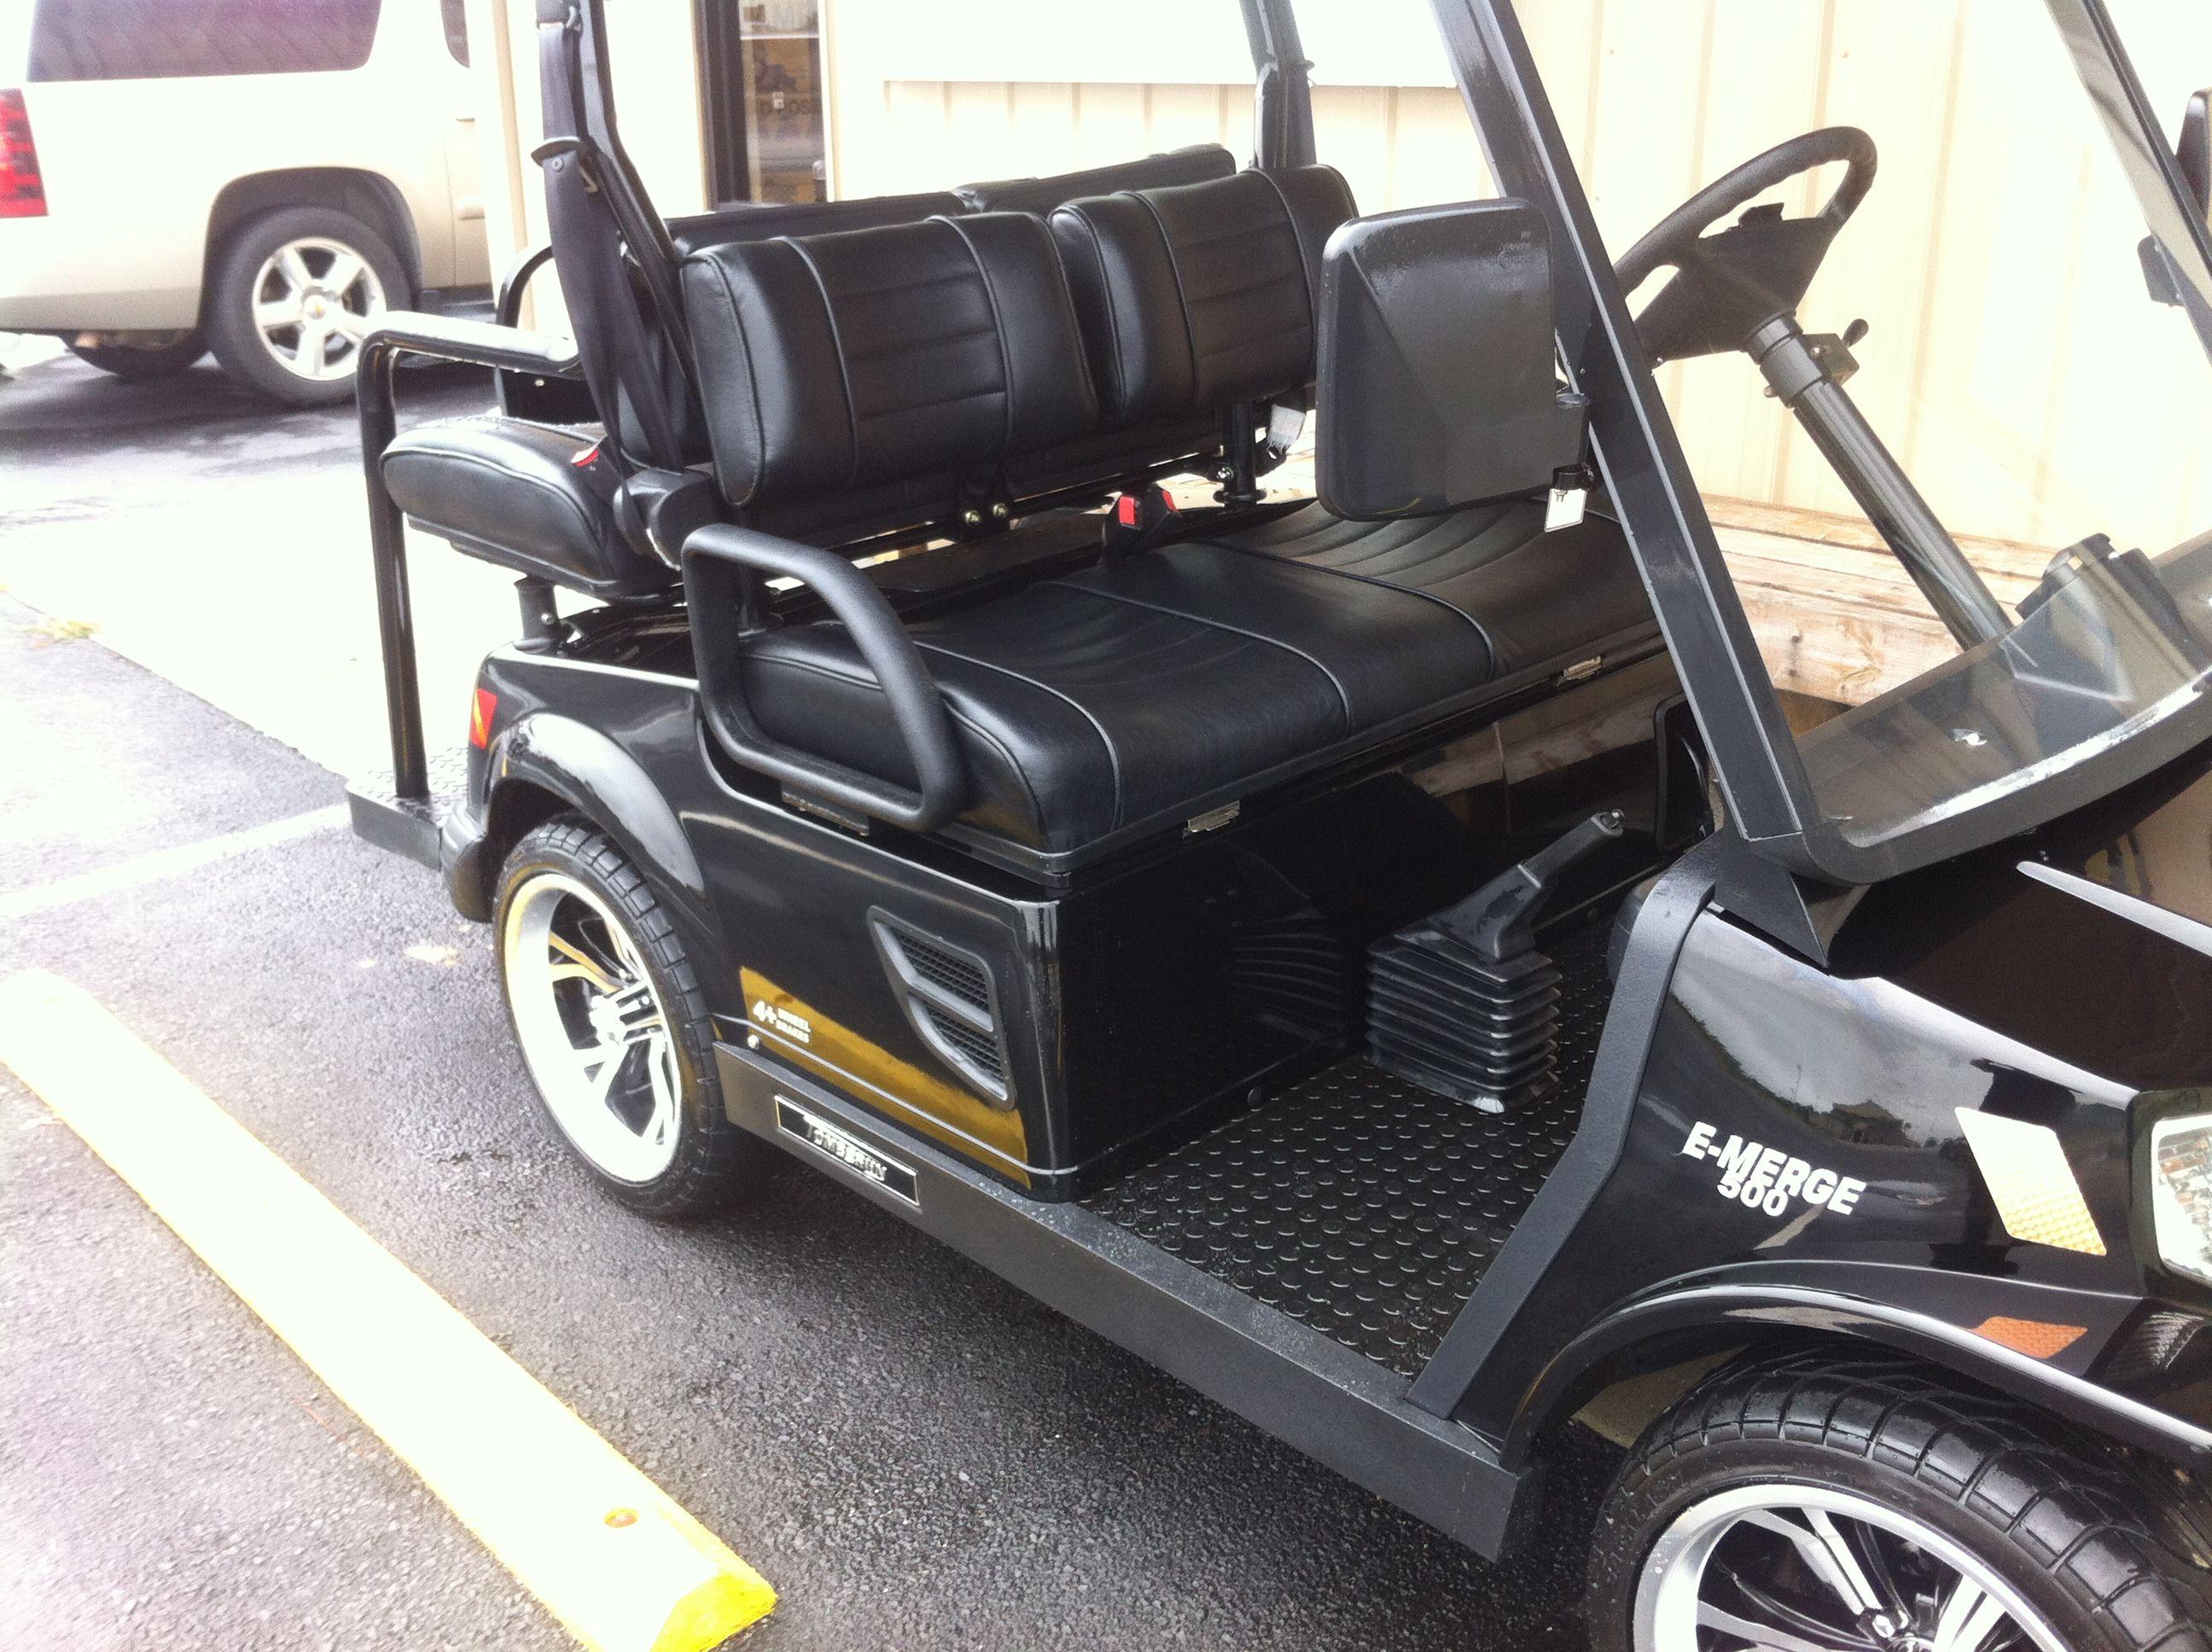 medium resolution of 2005 tomberlin street legal cart street legal golf cart